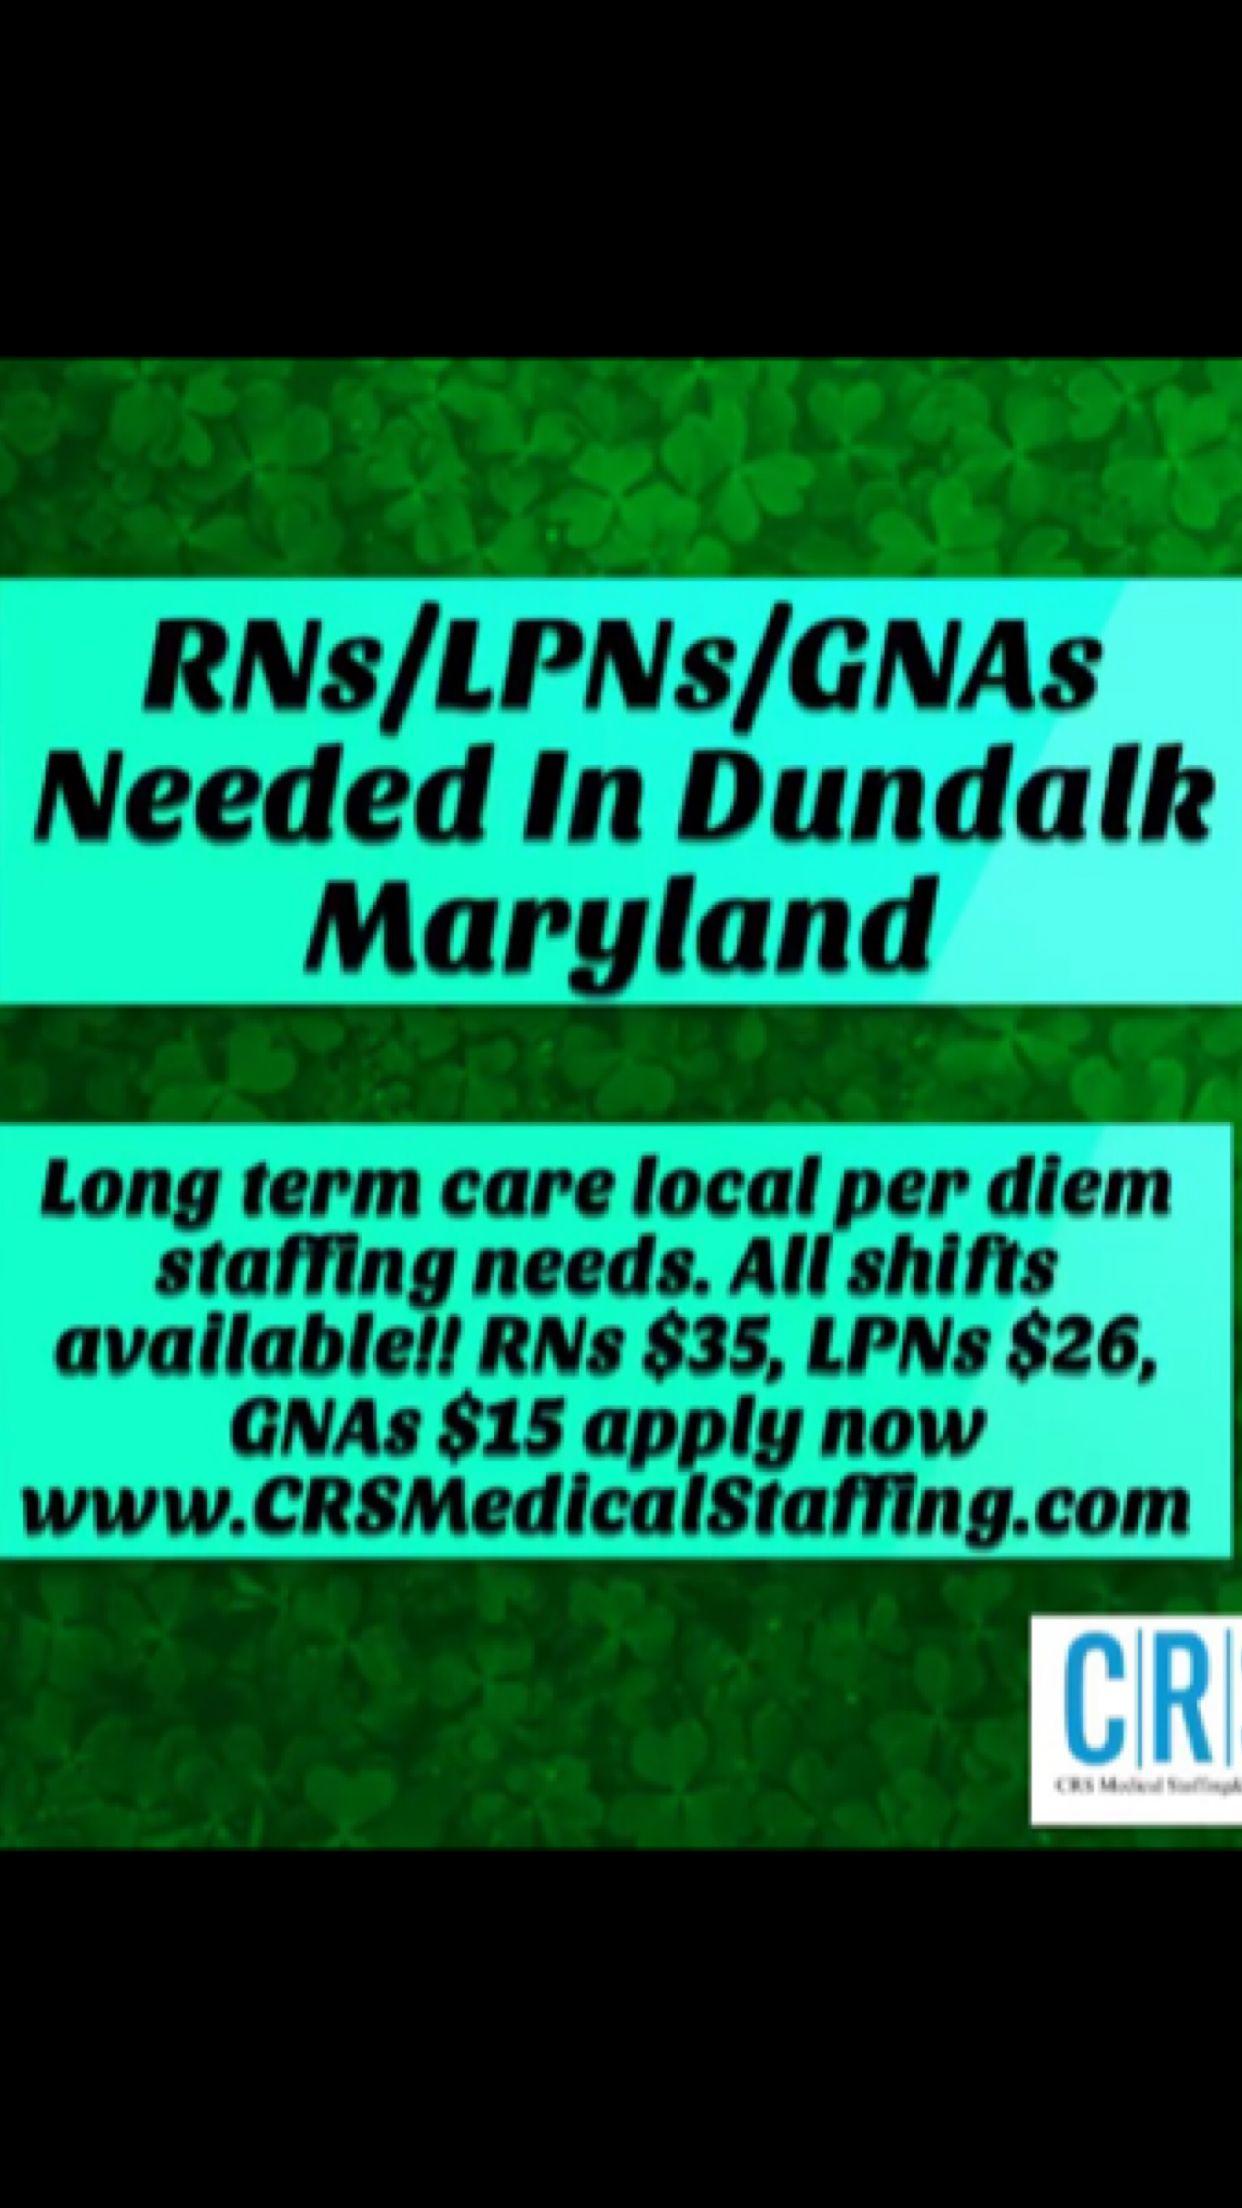 Travel nursing image by CRS Medical Staffing & Service on